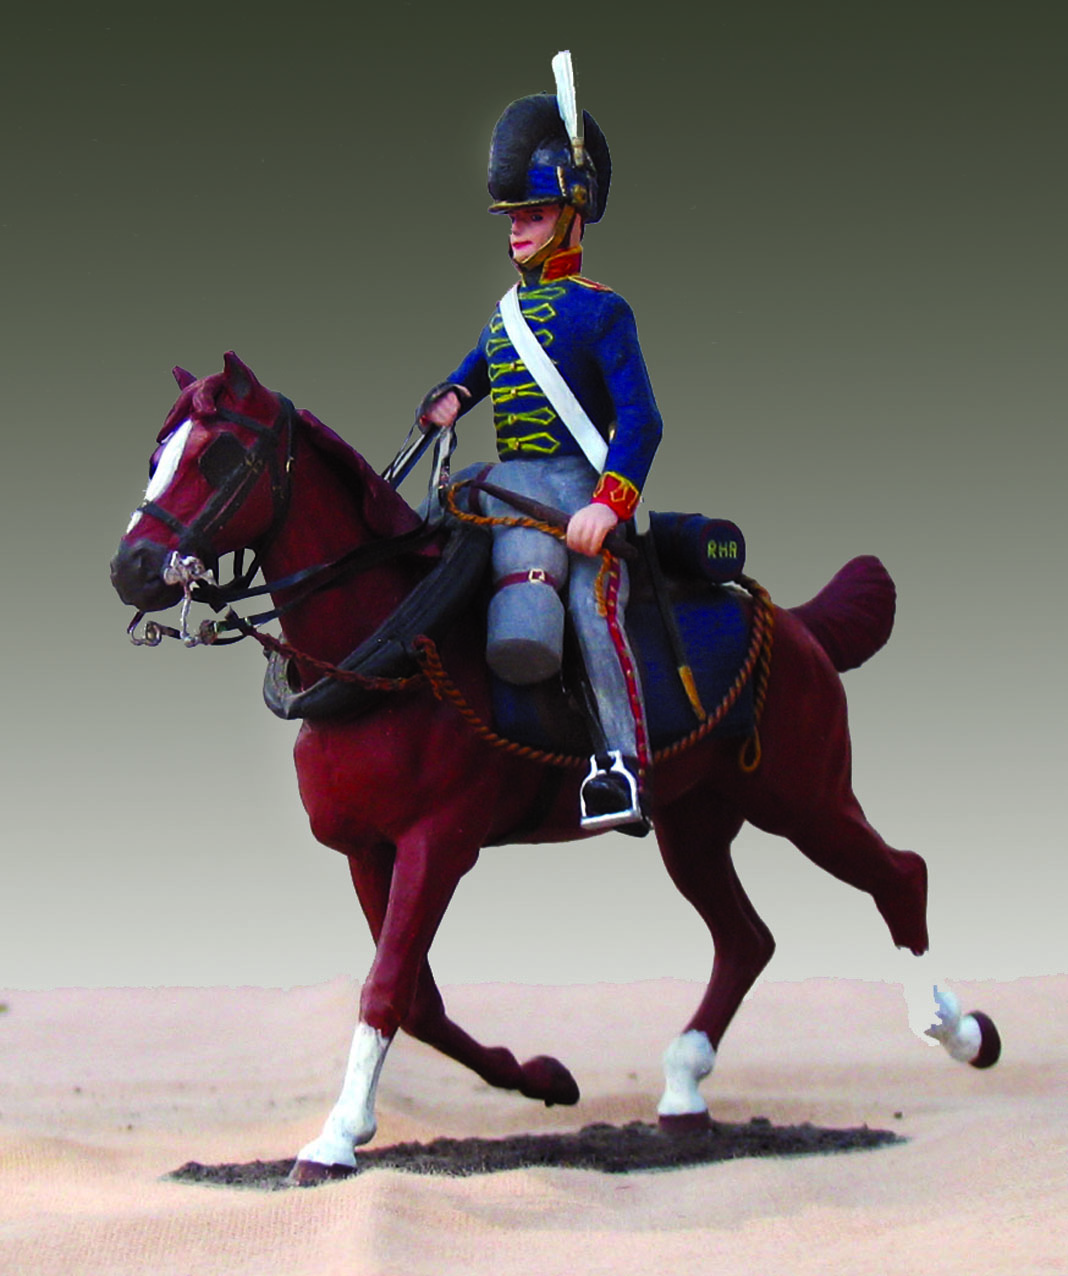 Storbritannien 1807, Royal Horse Artillery, Artillerist